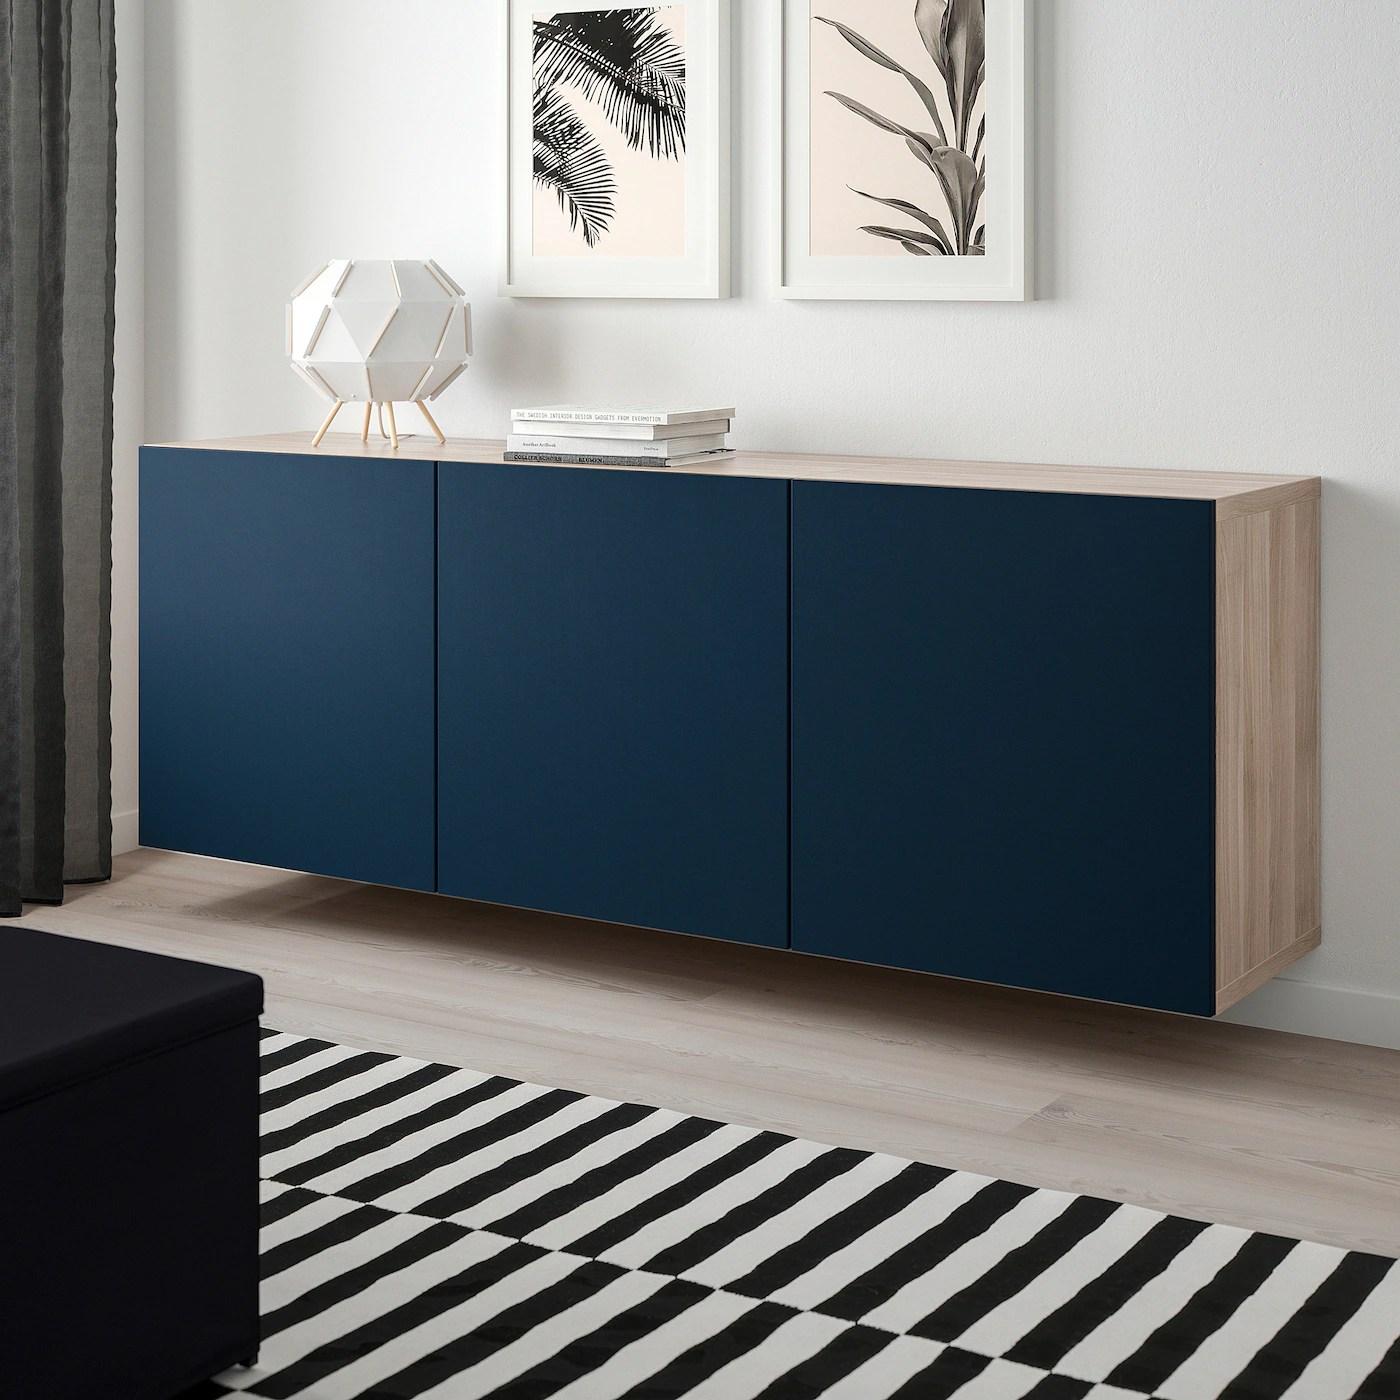 Furniture To Put Under Wall Mounted Tv Novocom Top